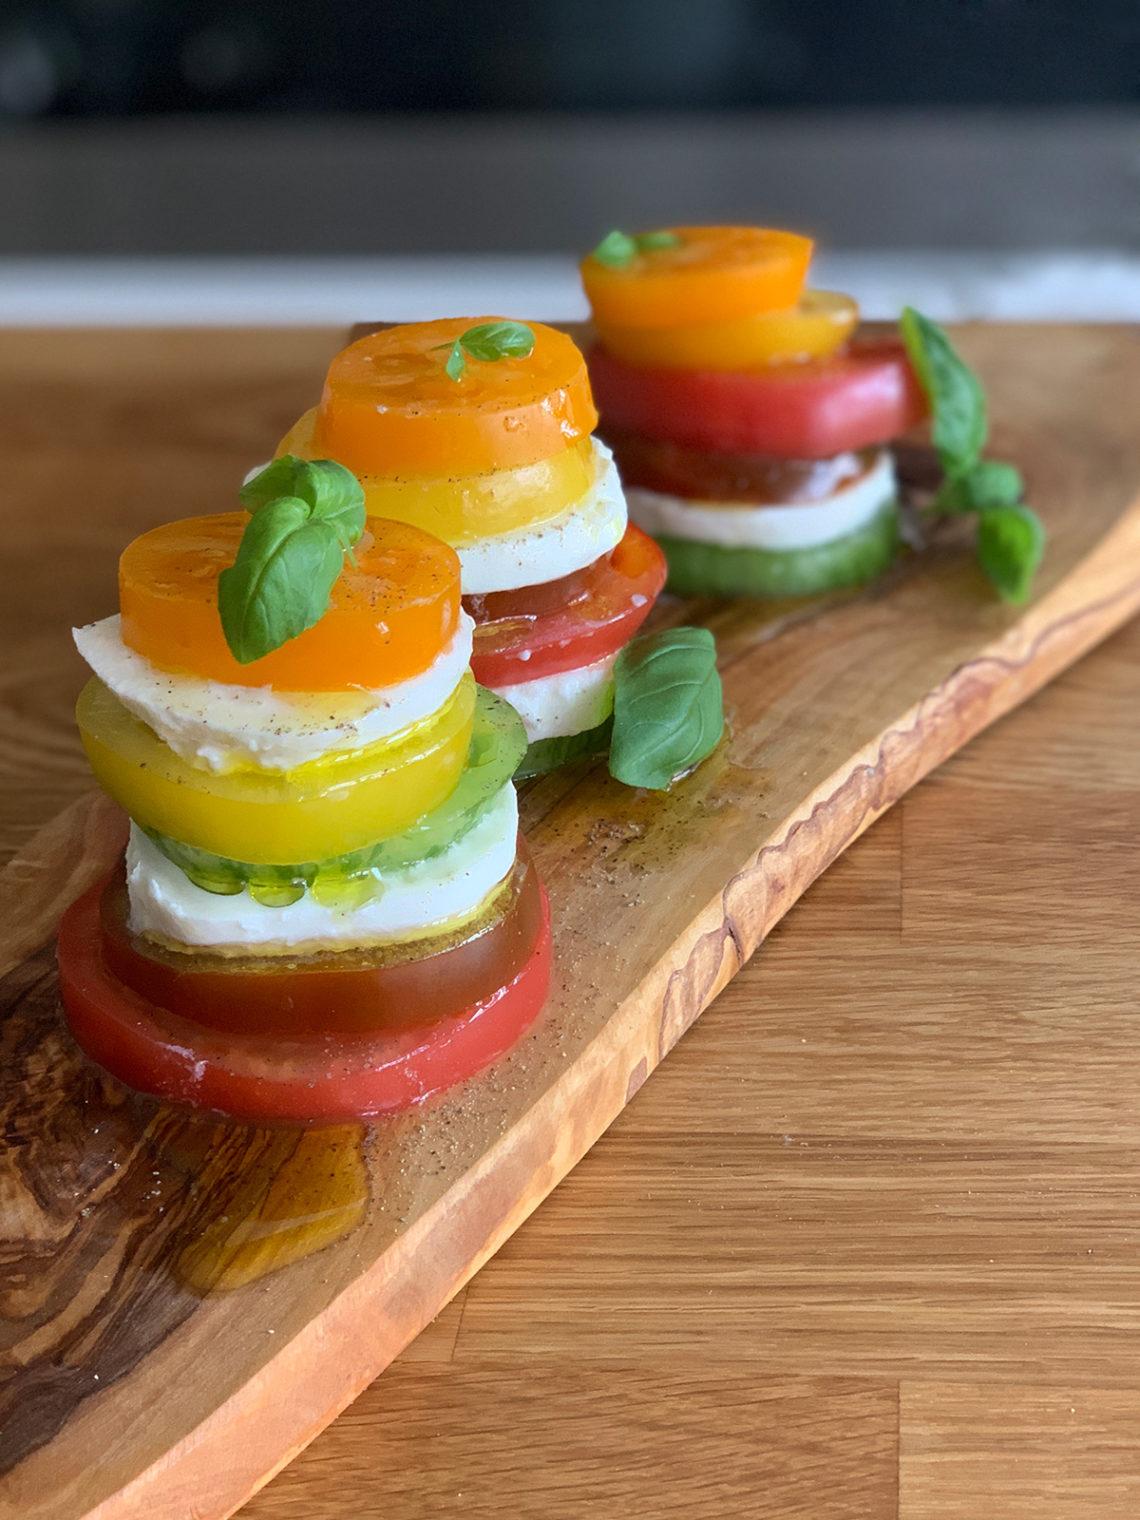 Tomato and mozzarella mille-feuille